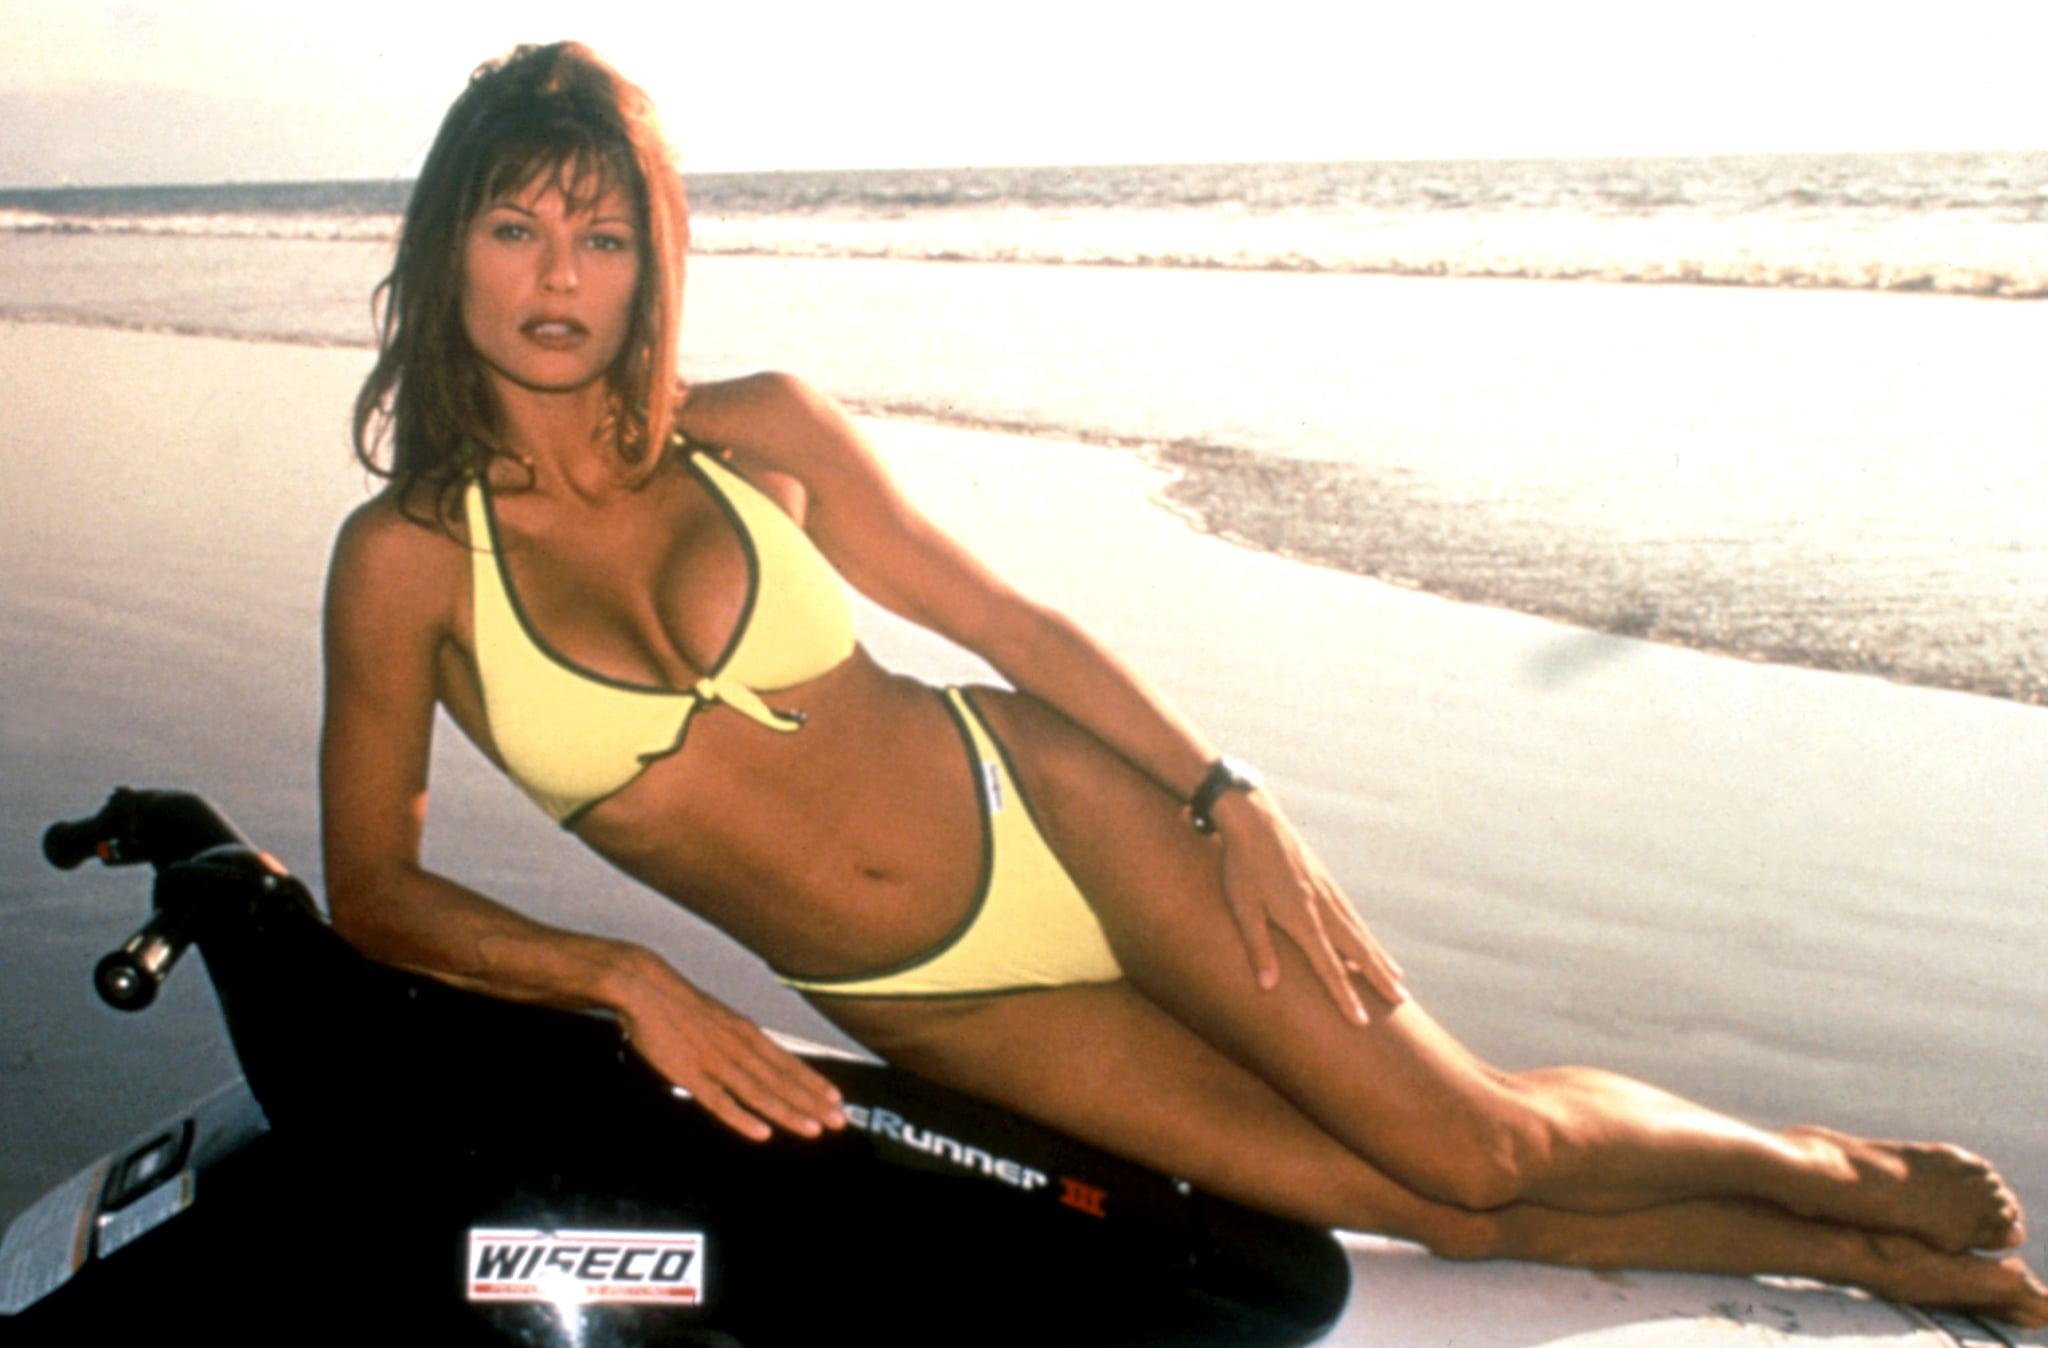 Alison Armitage Photos alison armitage, acapulco h.e.a.t. | the sexiest bikini